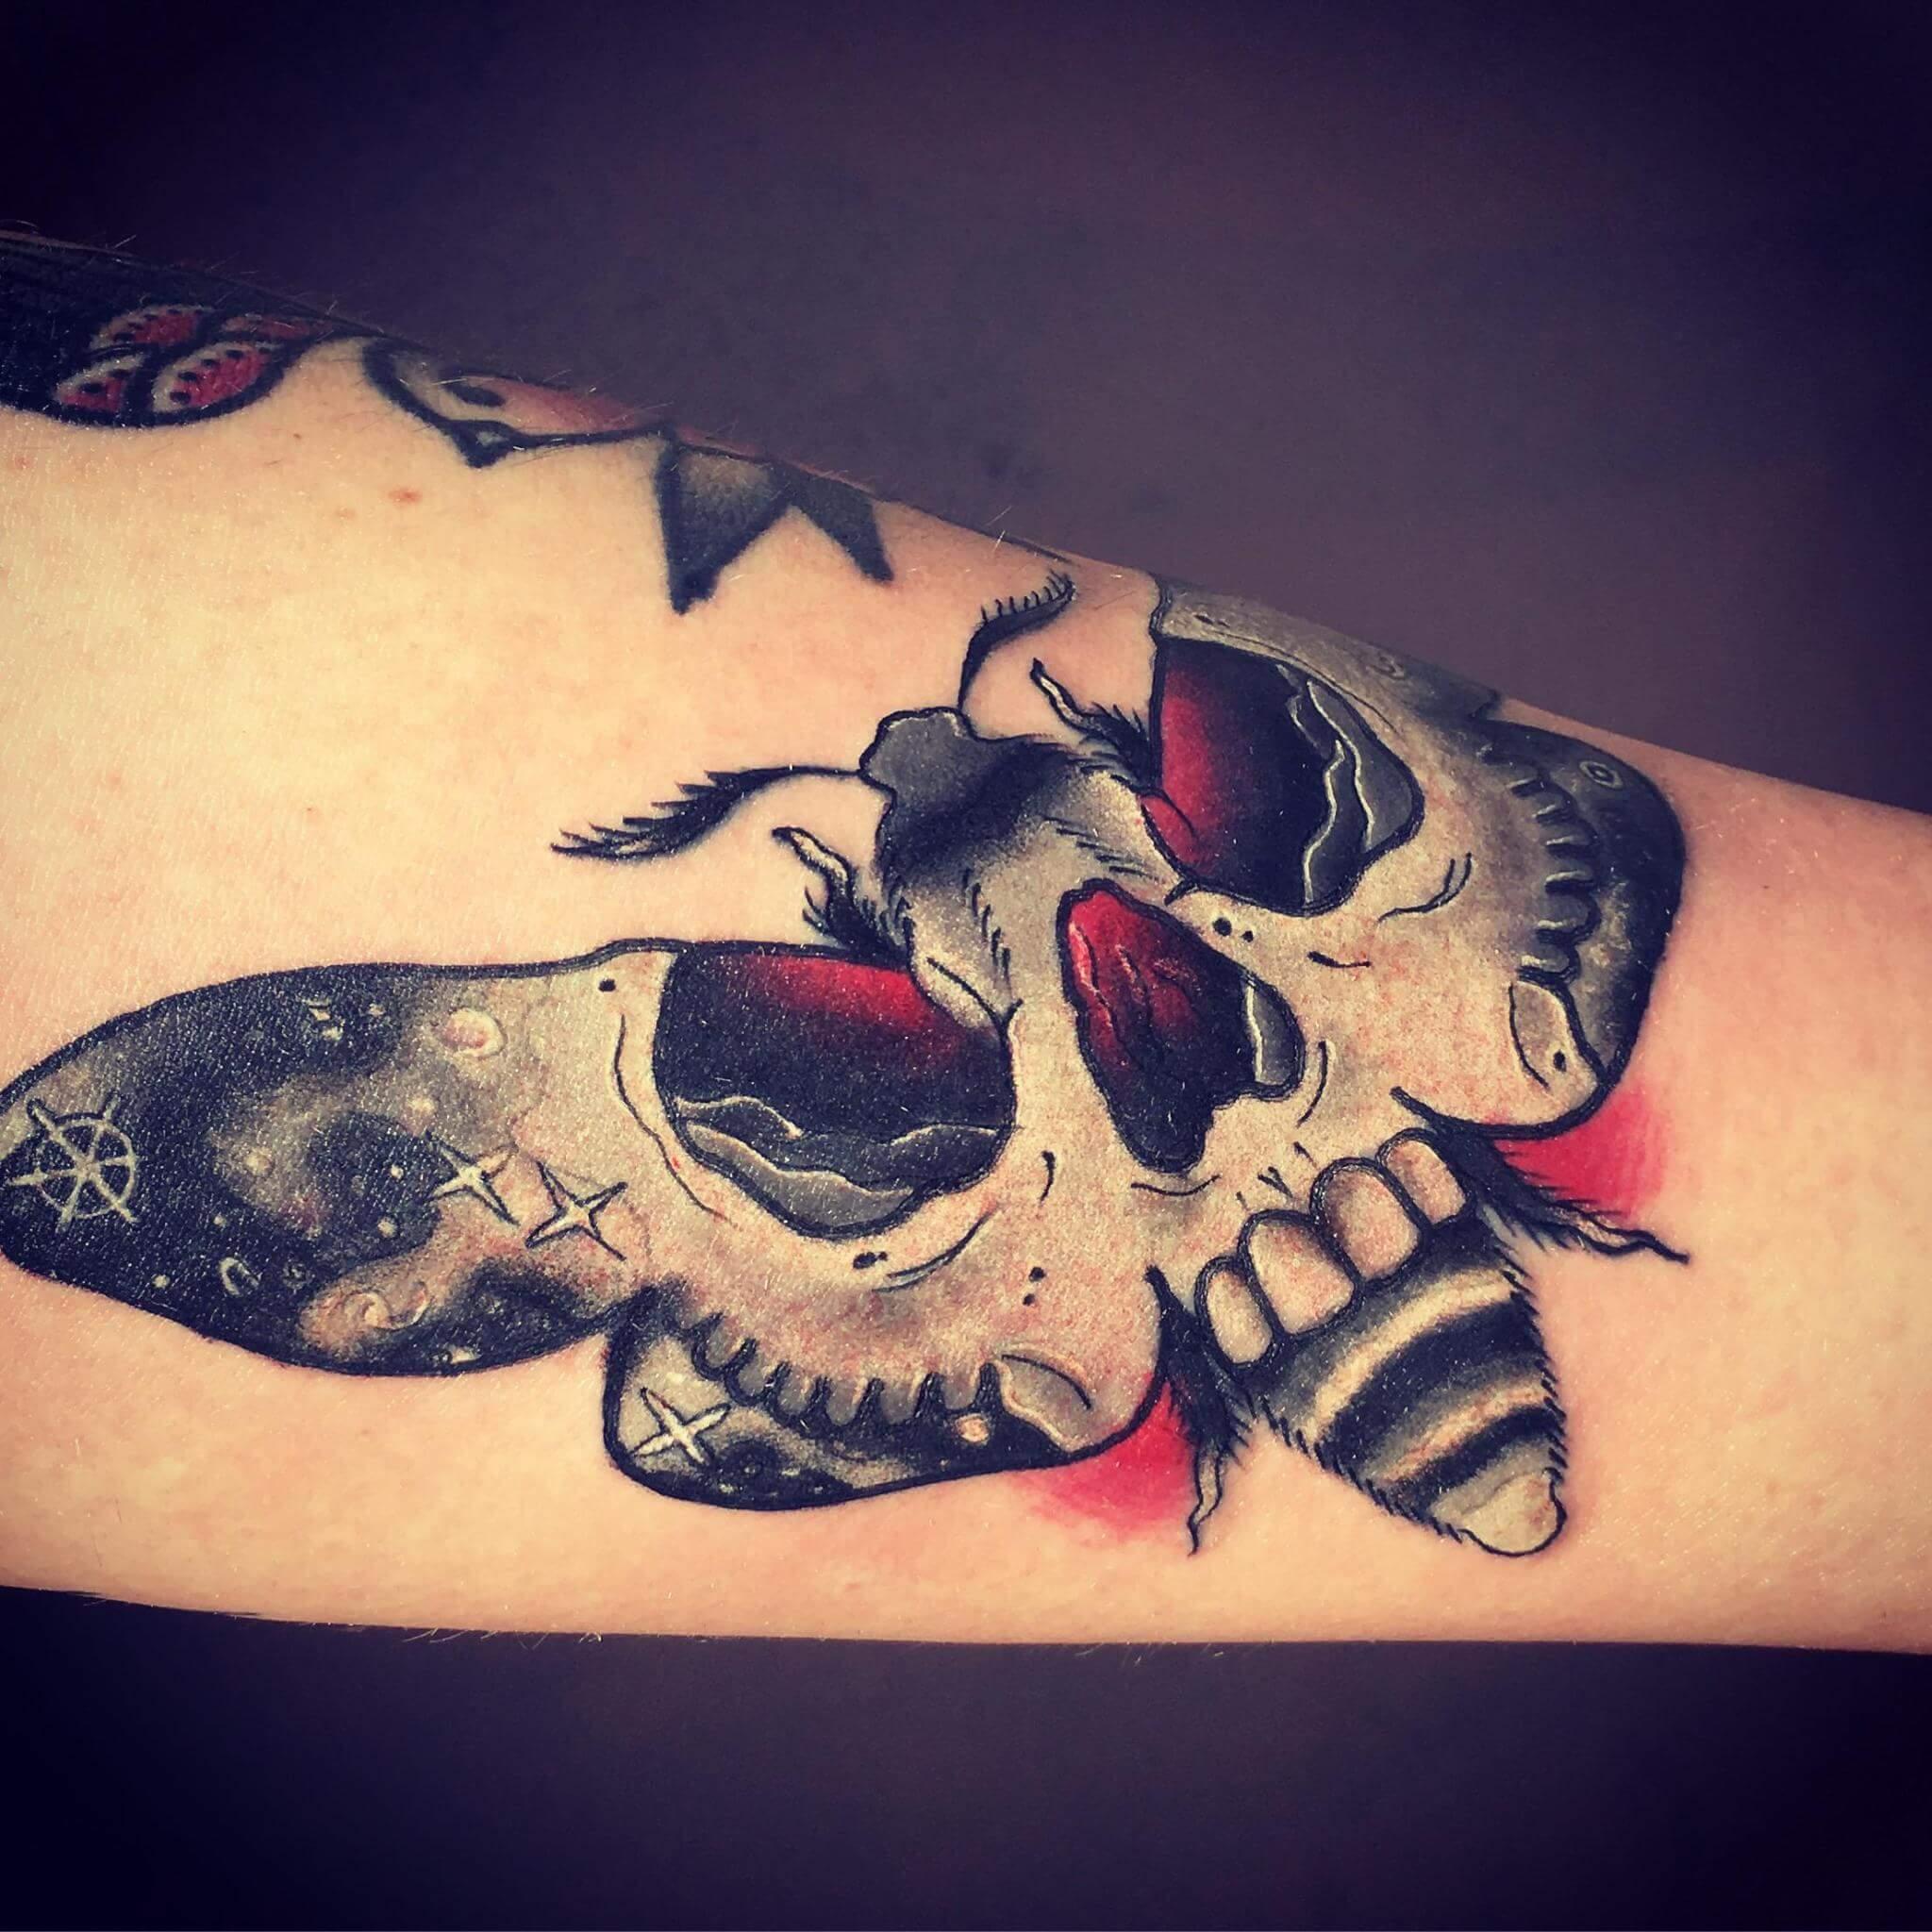 Tattoo Motte mit Totenkopf als Muster